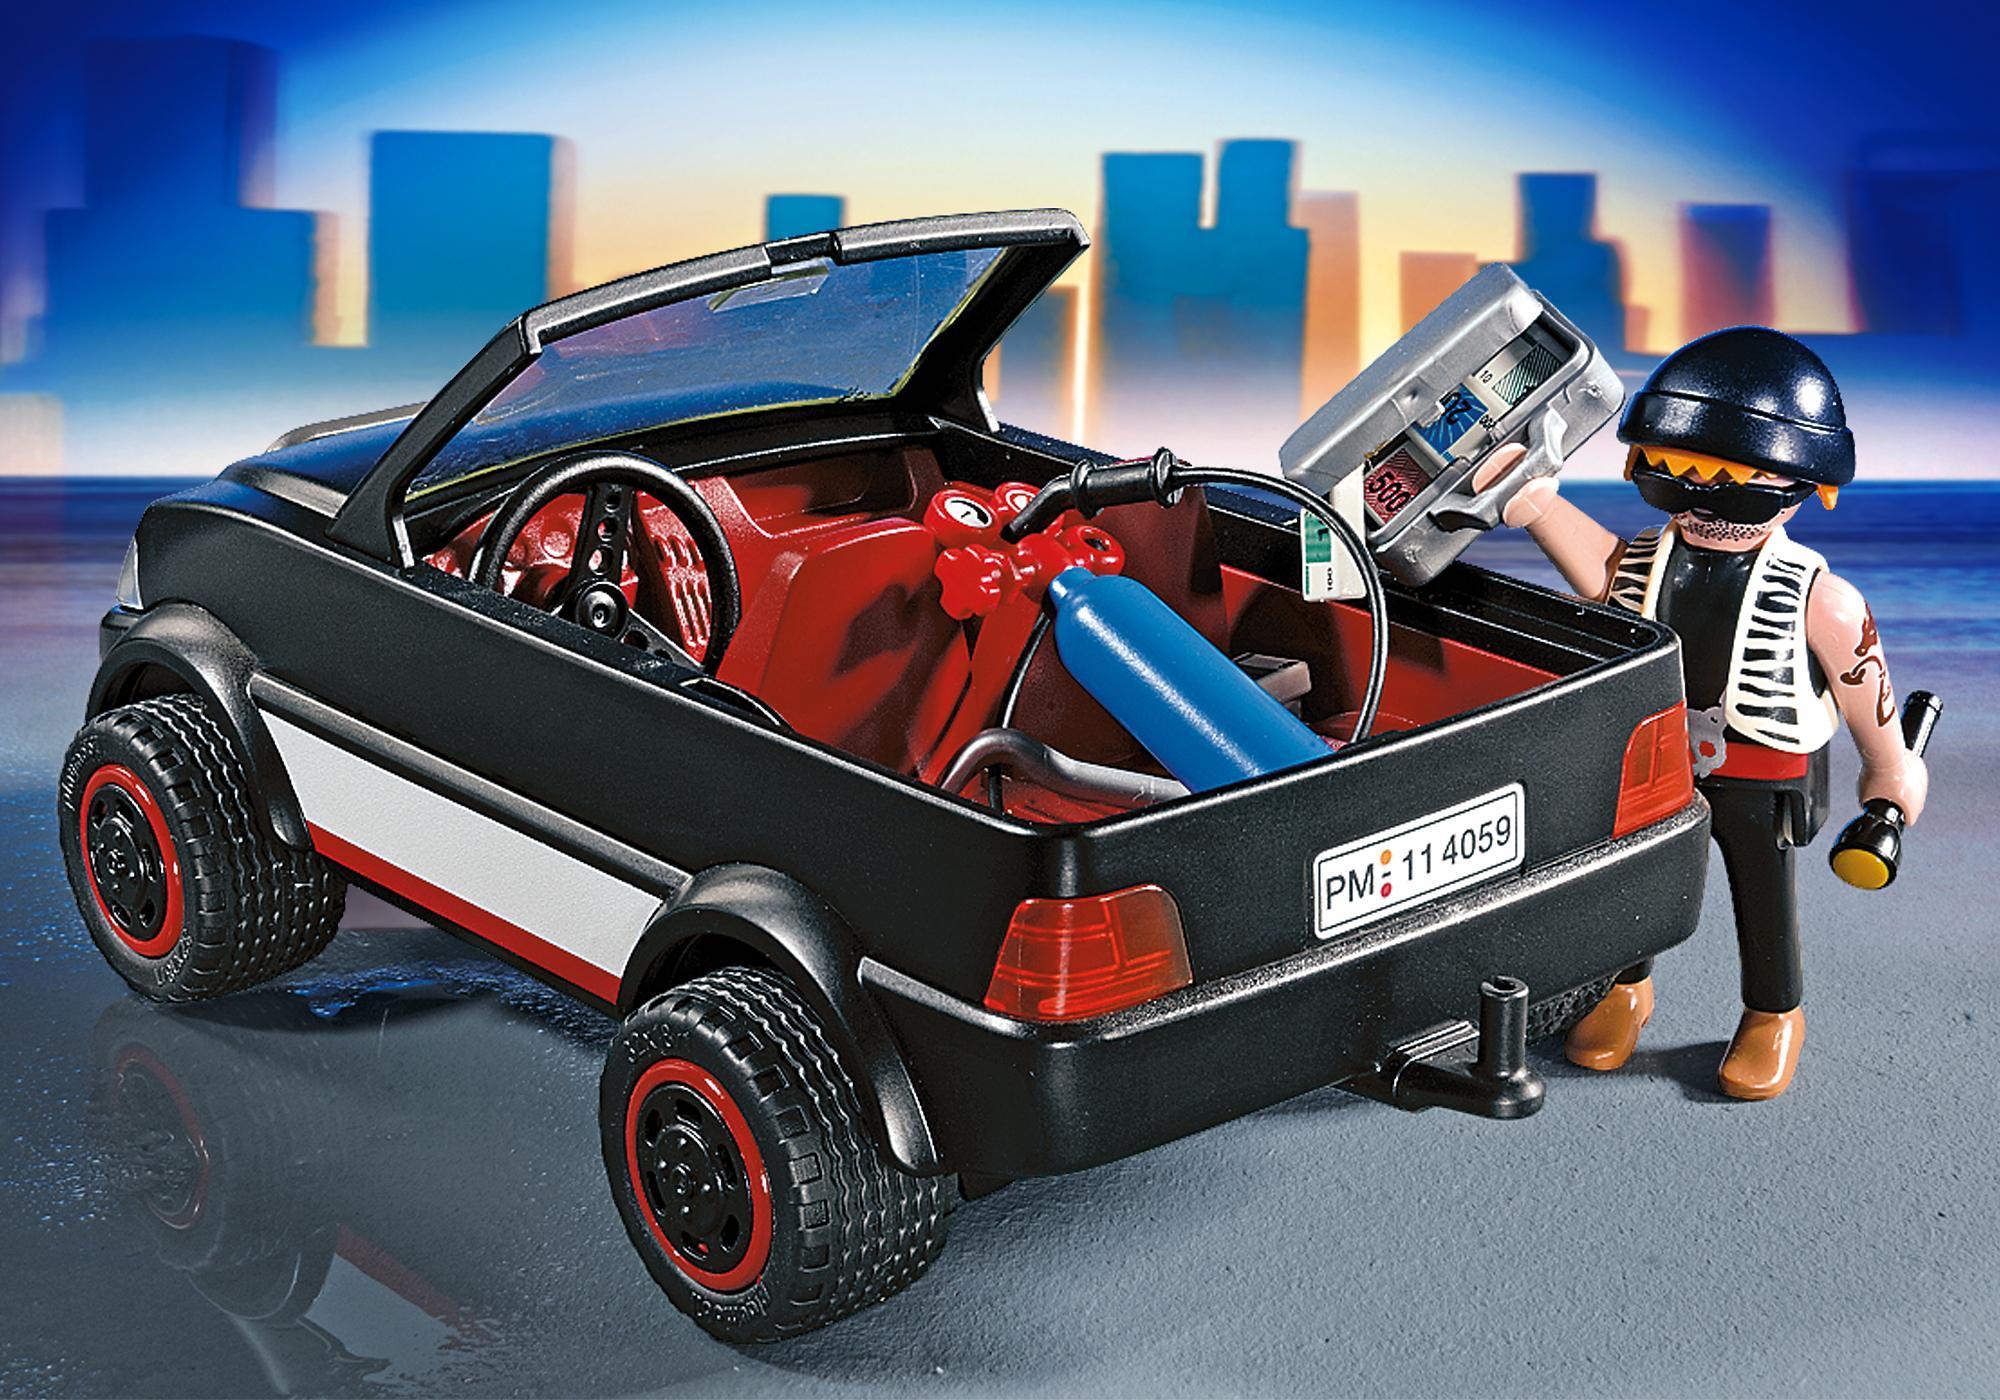 http://media.playmobil.com/i/playmobil/4059_product_extra1